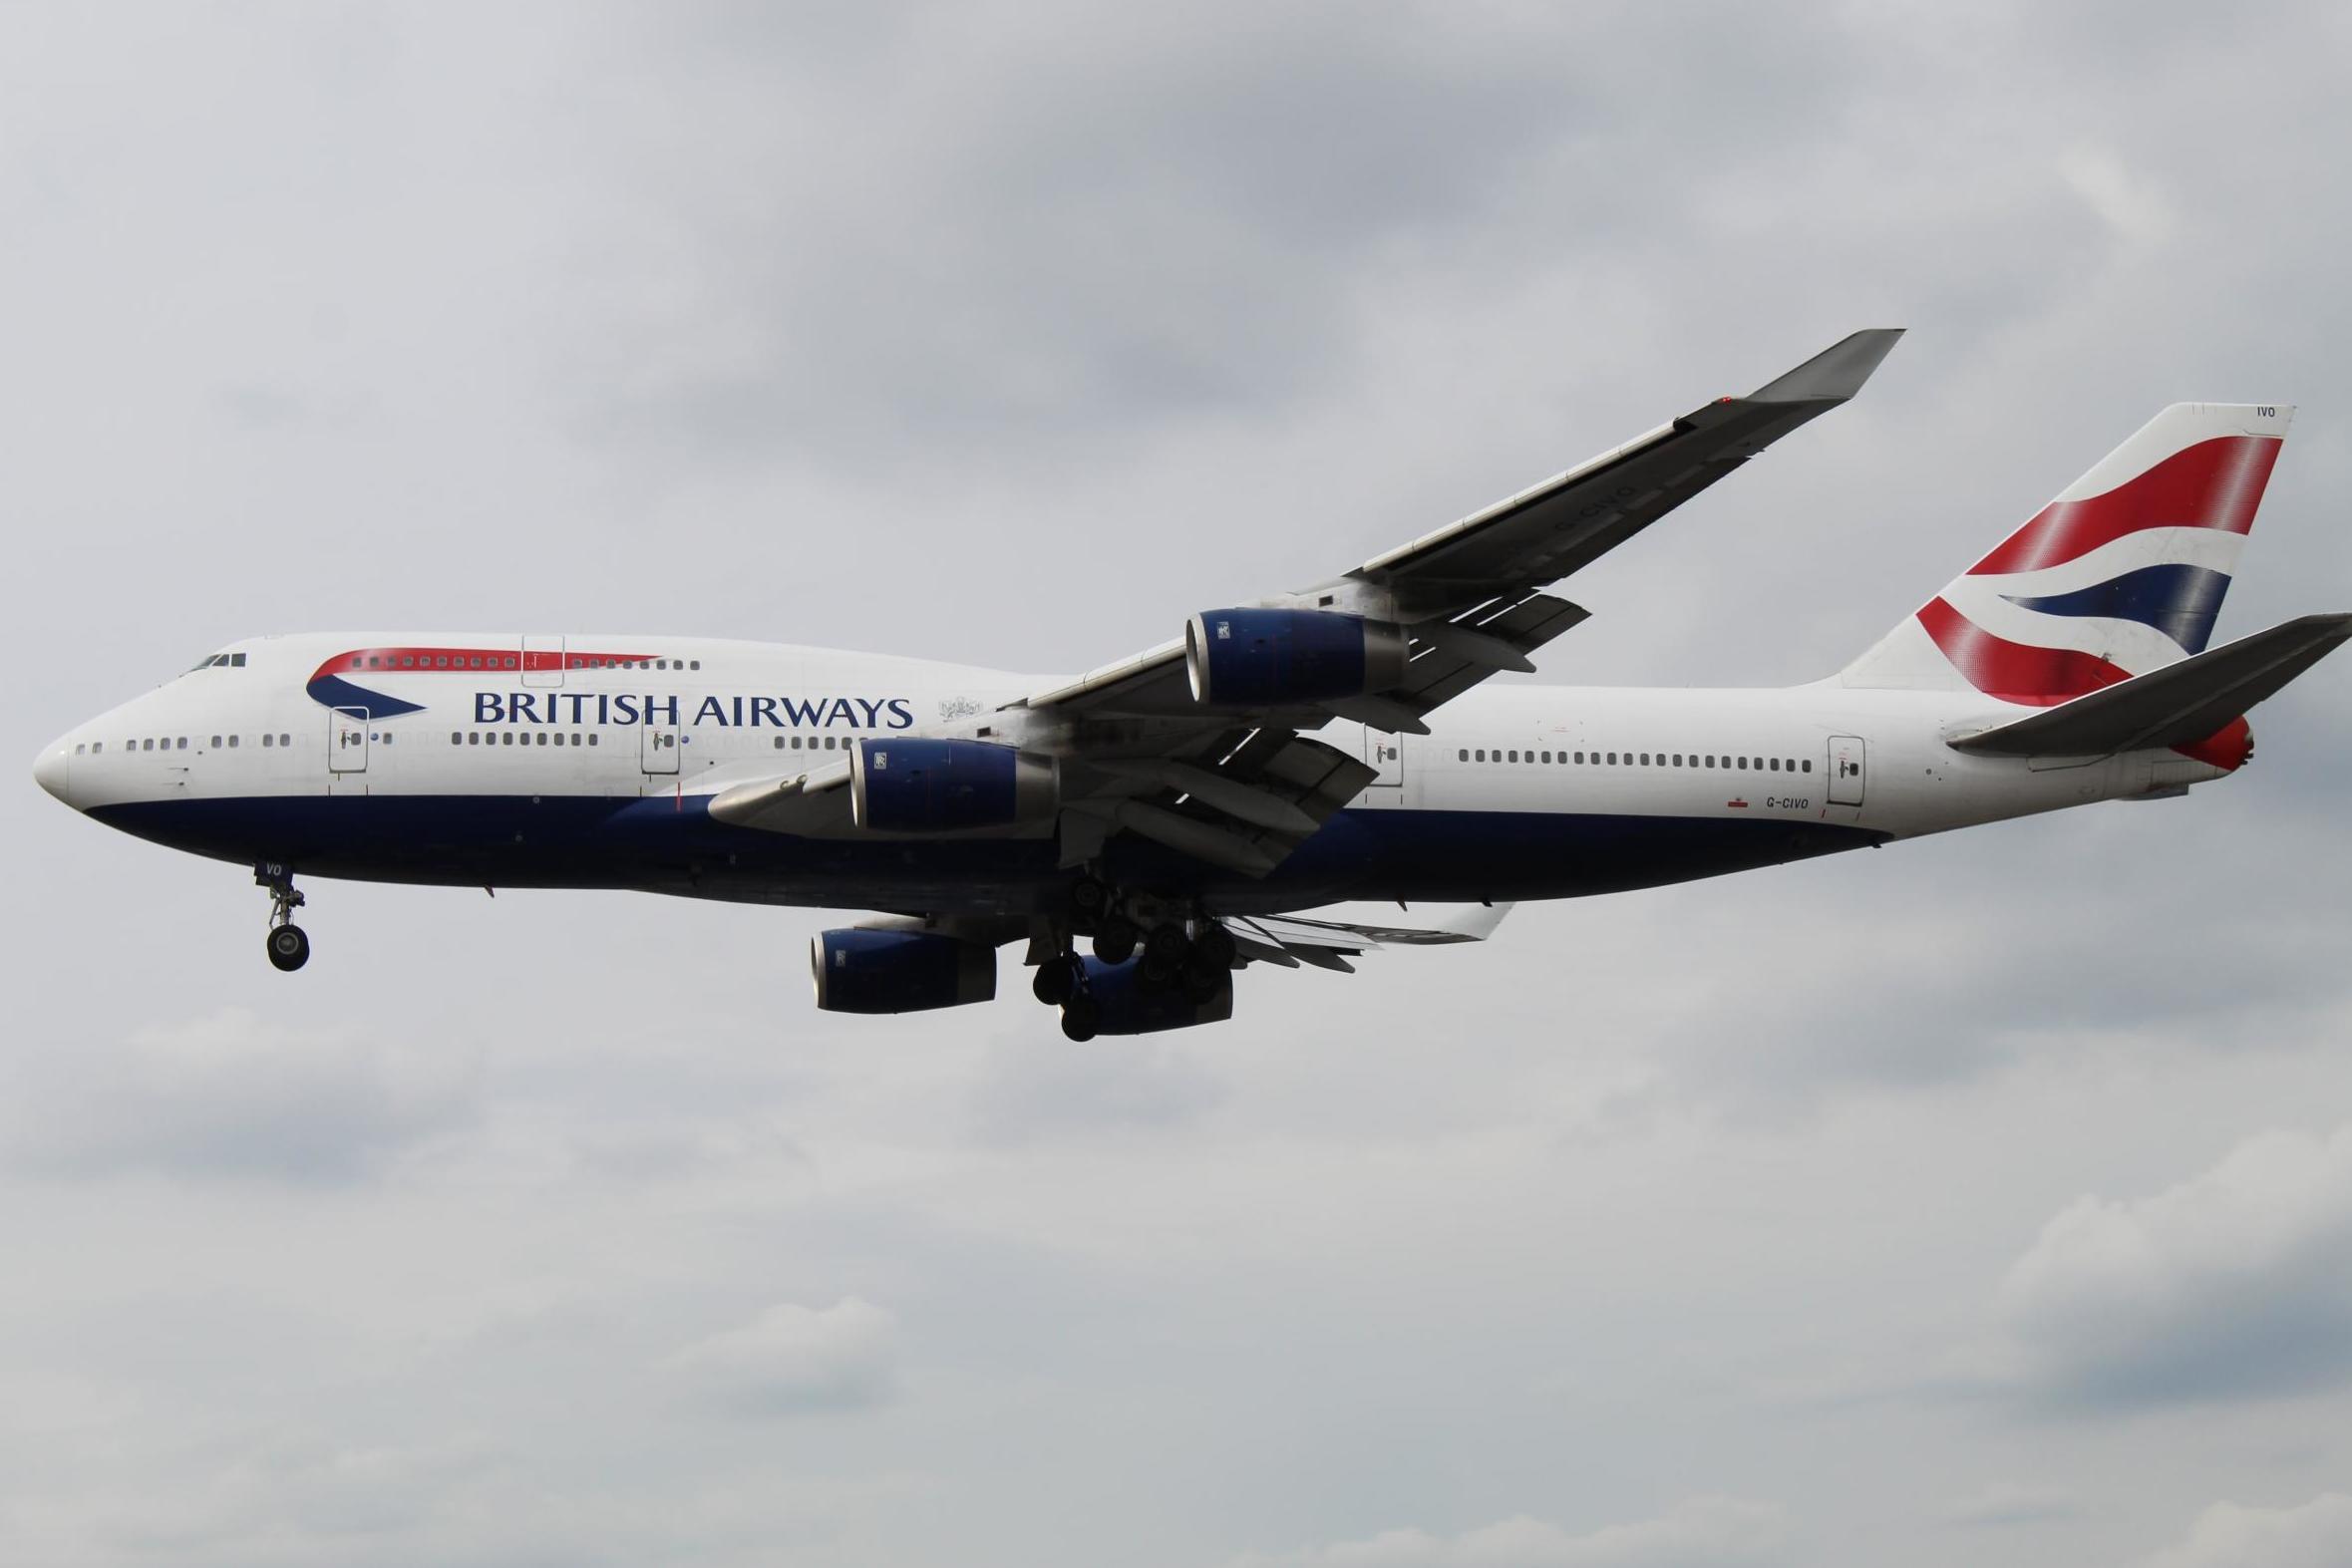 British Airways job cuts: what will the redundancies mean for passengers?